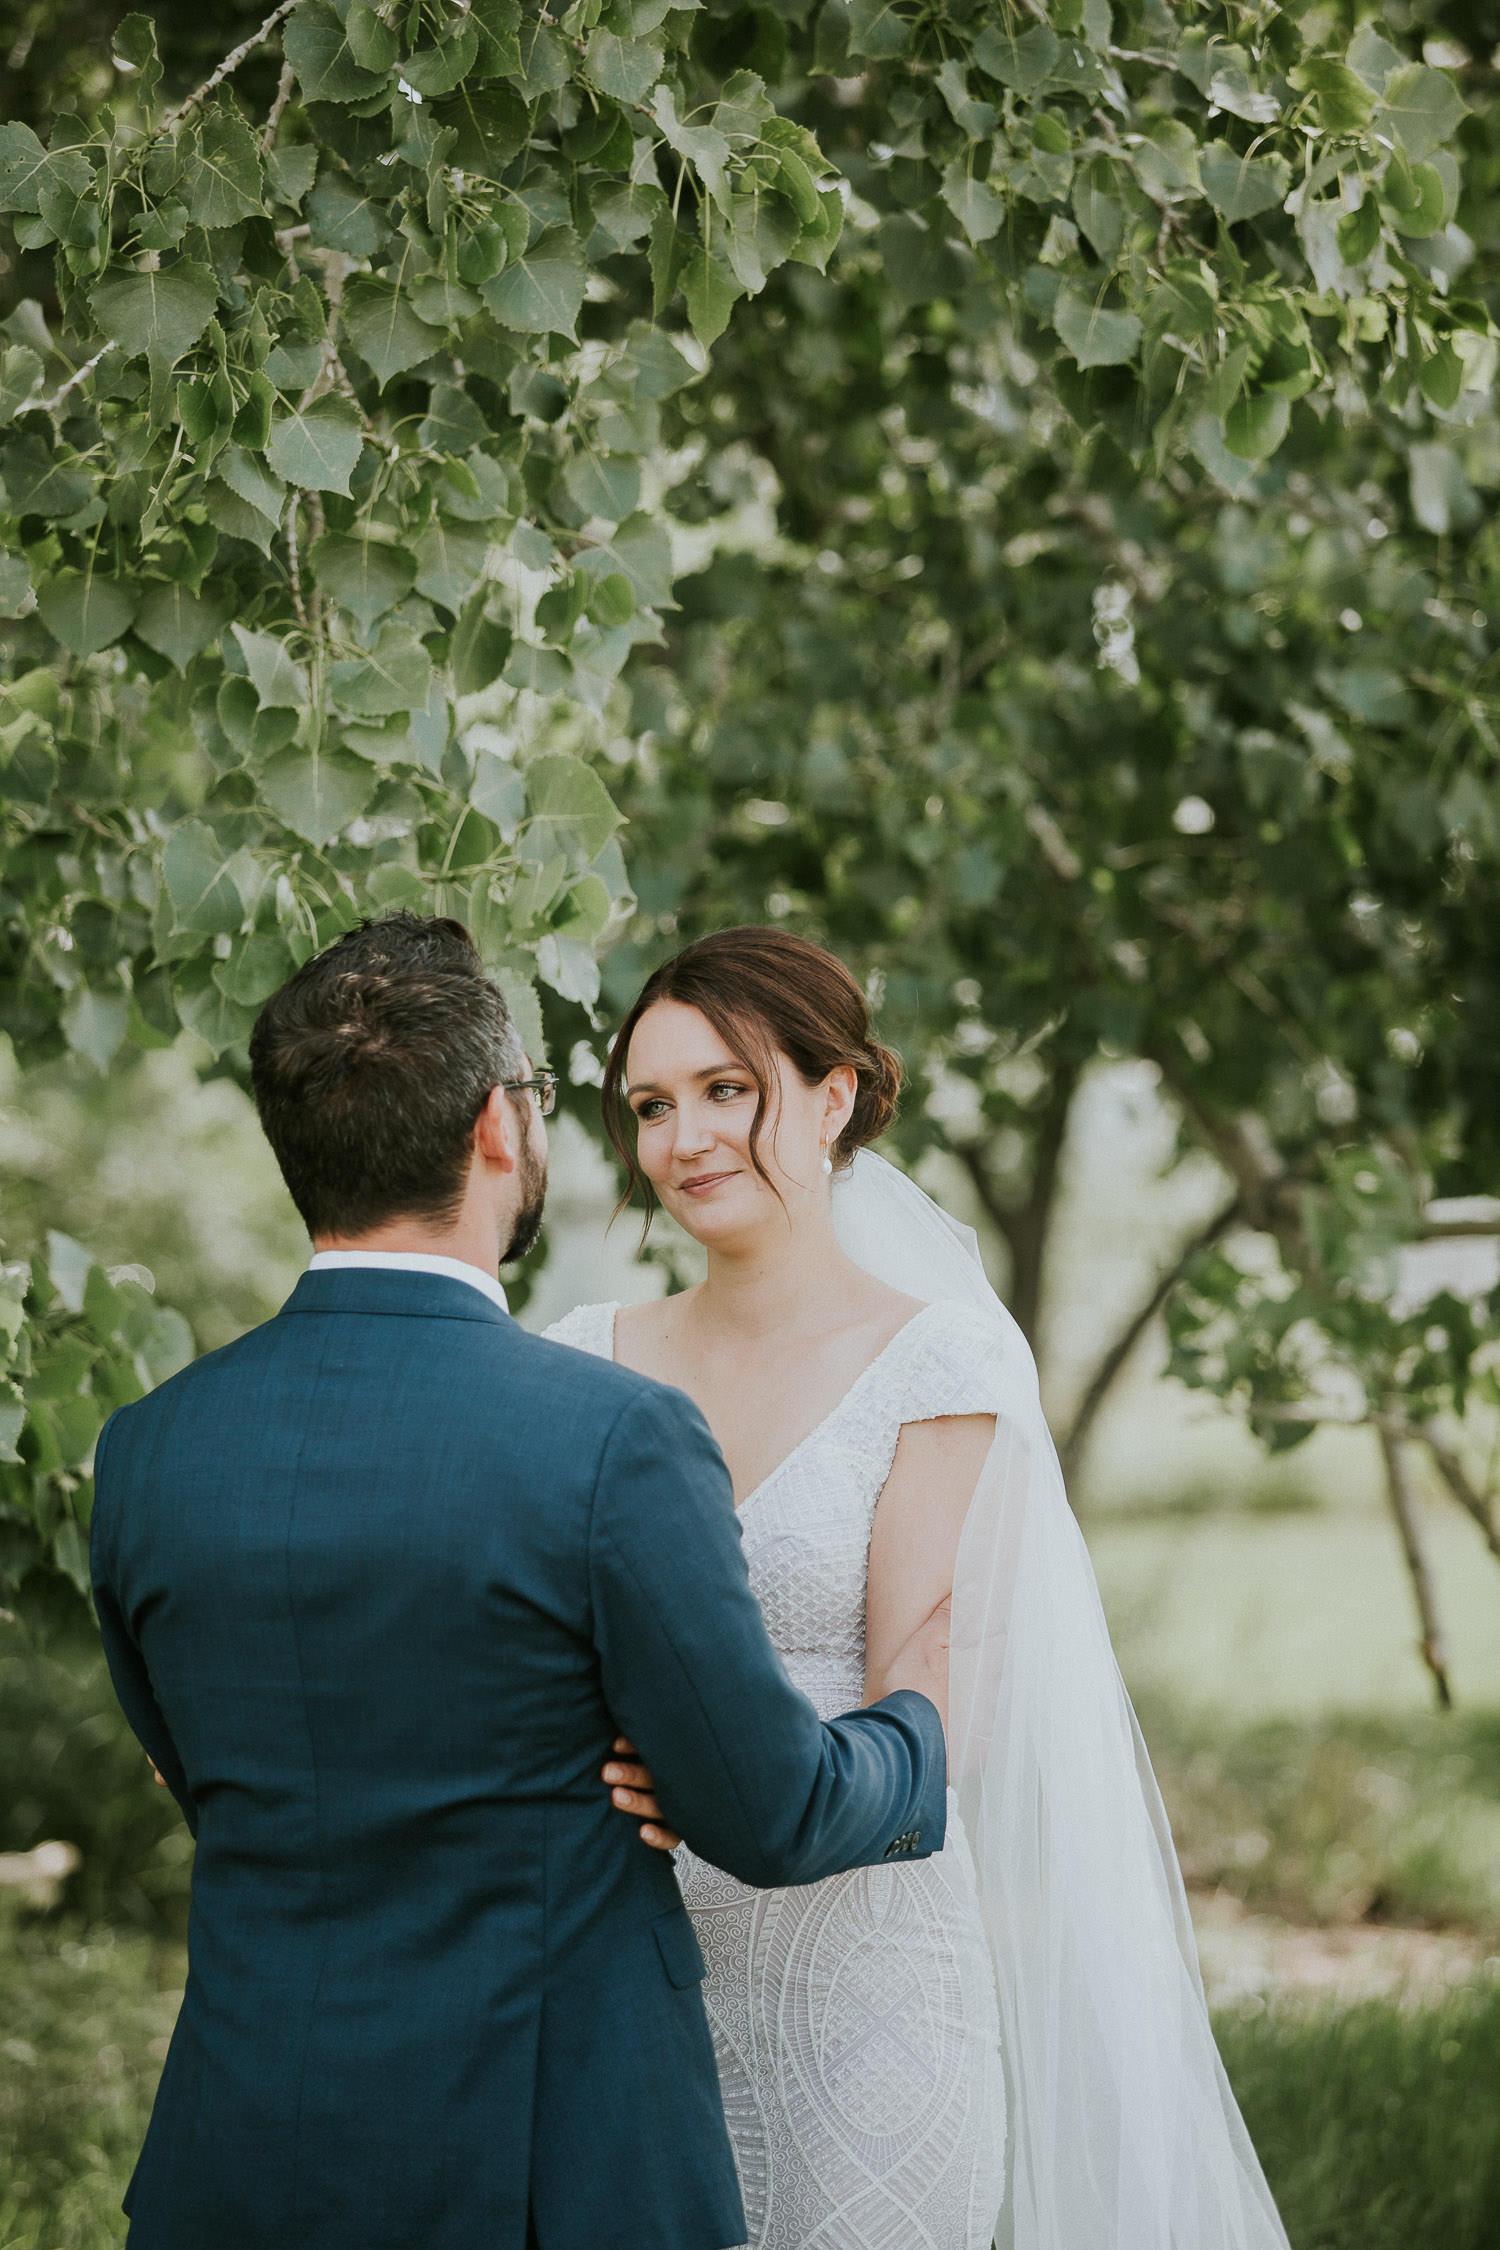 summer-backyard-wedding-in-alberta-sarah-pukin-0046